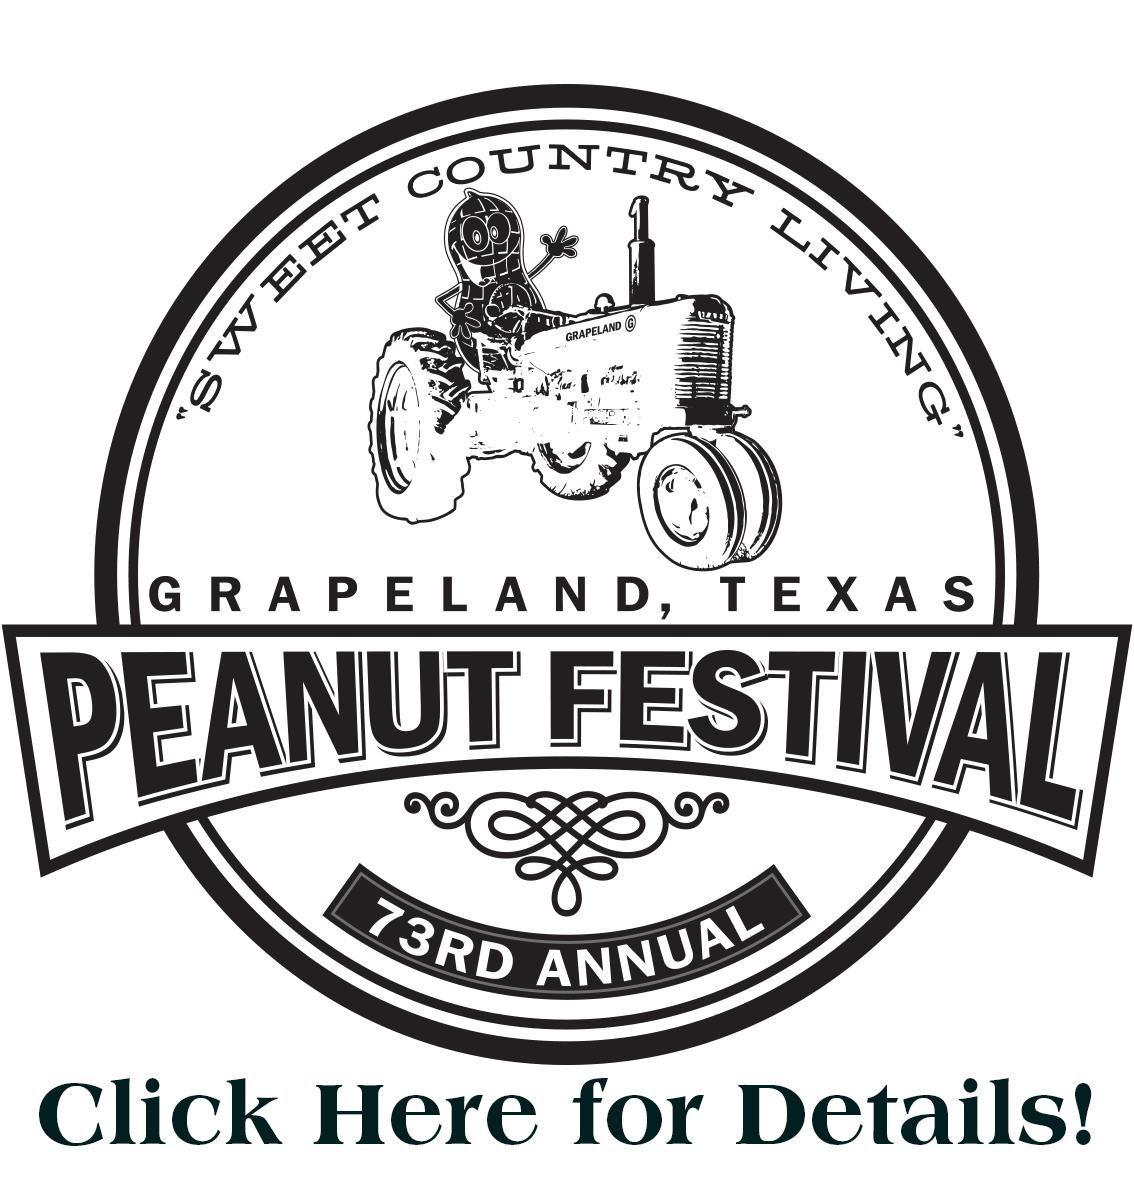 Grapeland-Chamber-peanut-festival-web-ad-2018-1.jpg